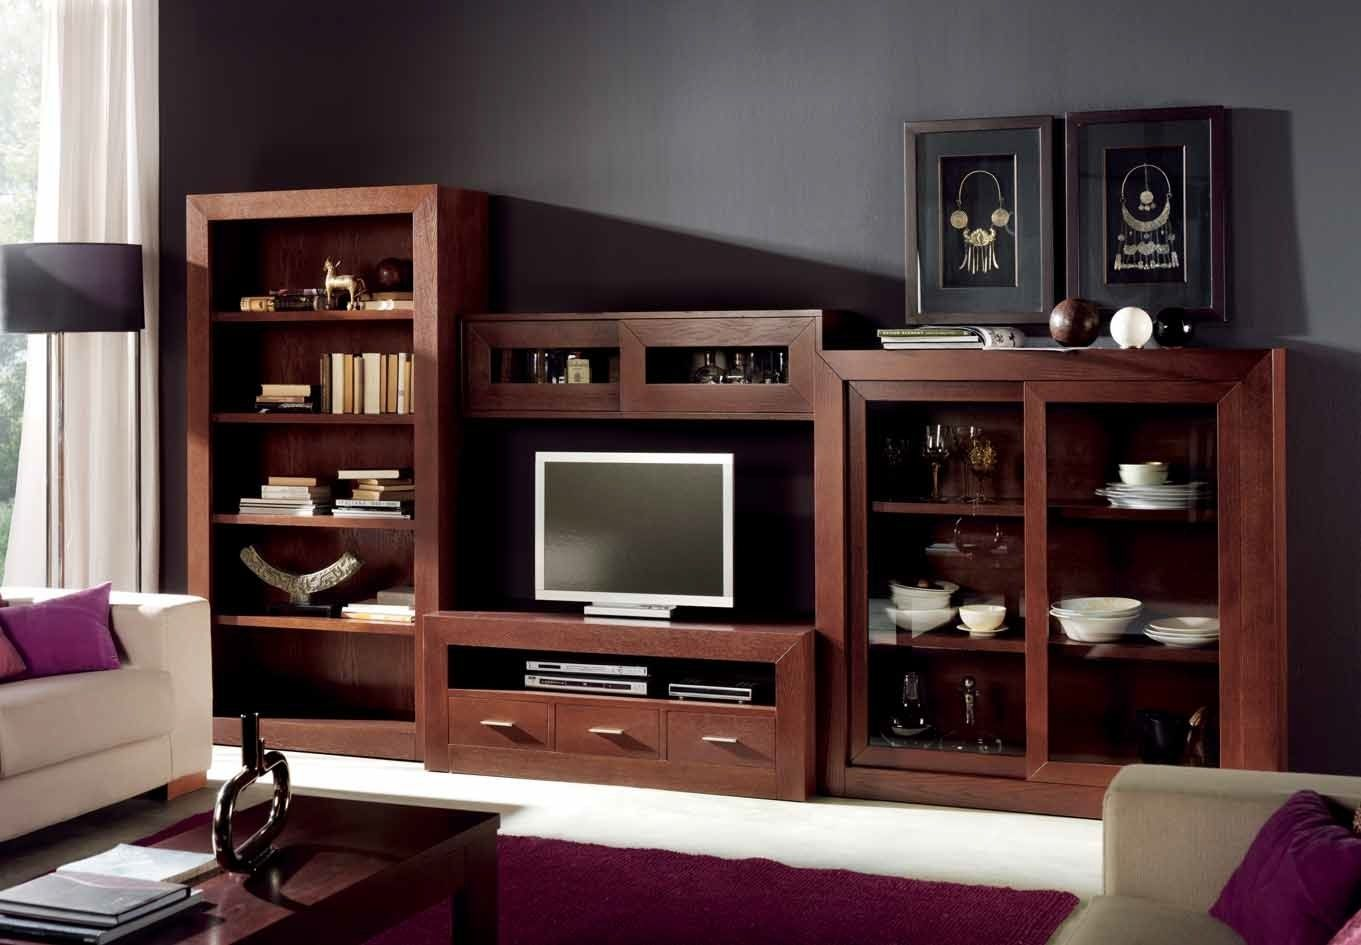 Muebles Modulares De Salon Mueble Modular Tv Completo De Saln  # Muebles Modulares Lukar